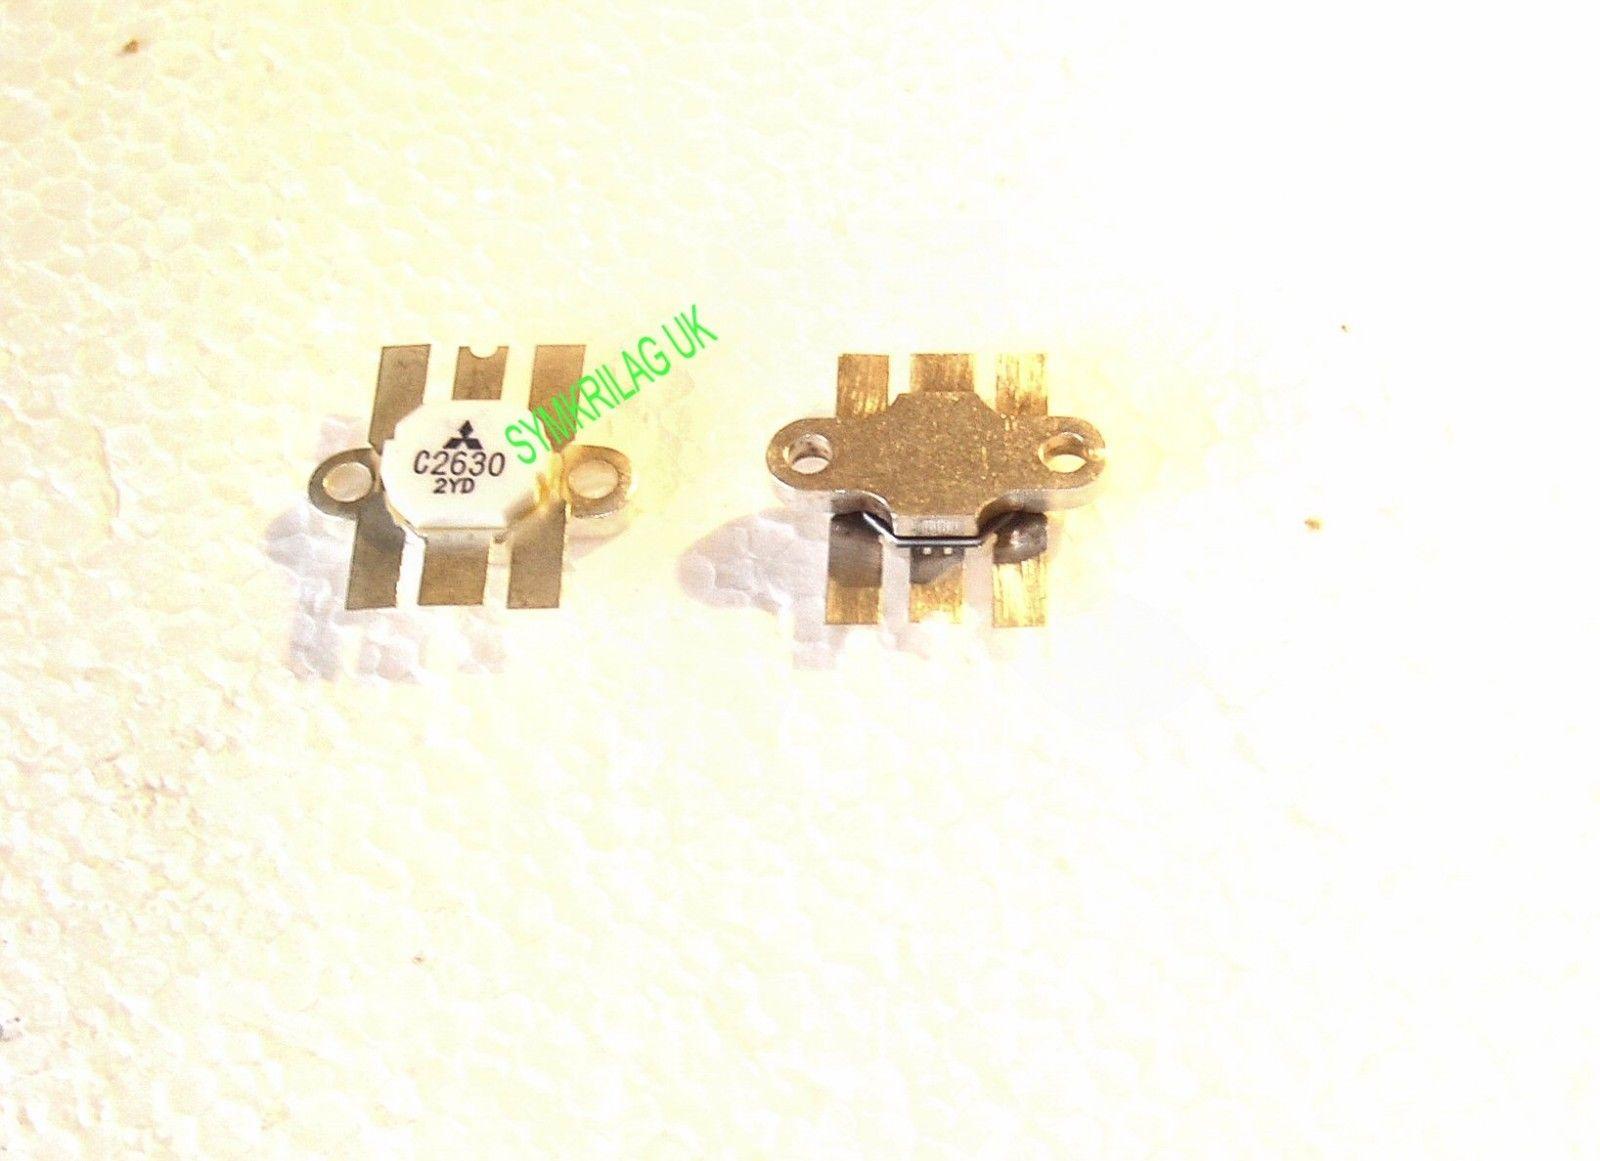 2sc2630 Mitsubishi Genuine Vhf Bipolar Rf Power Transistor 125v 60w Transistored Amplifier Circuit 175mhz Symkrilag Uk